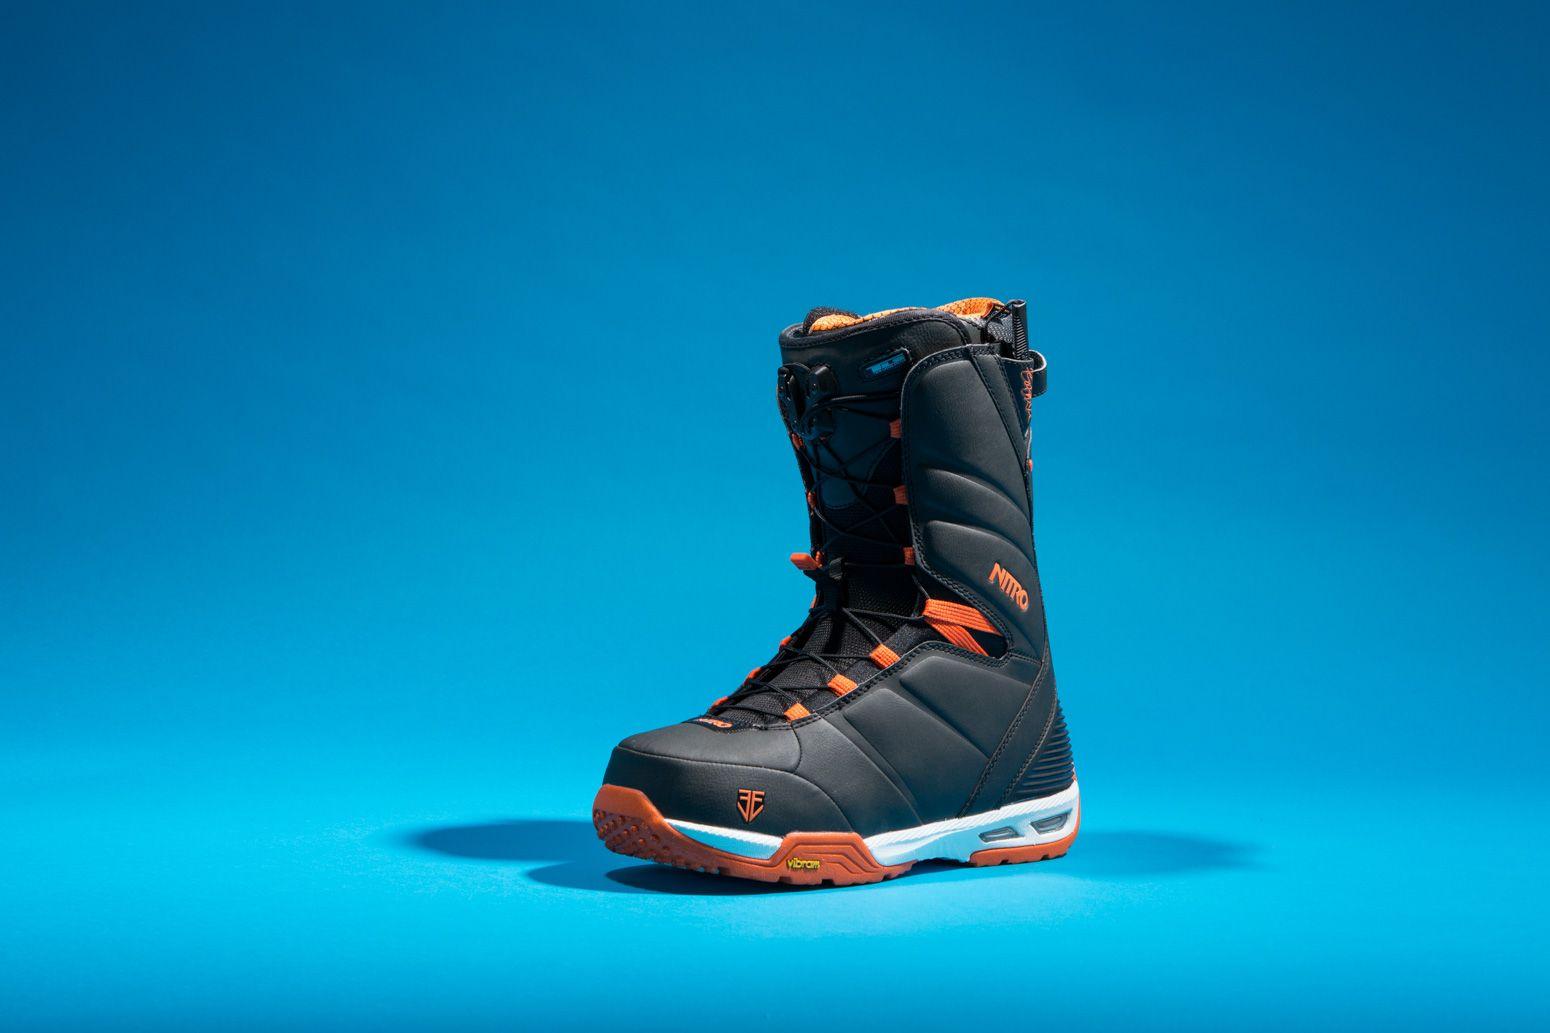 21 Best Men's Snowboard Boots 2015 2016   Snowboarding men